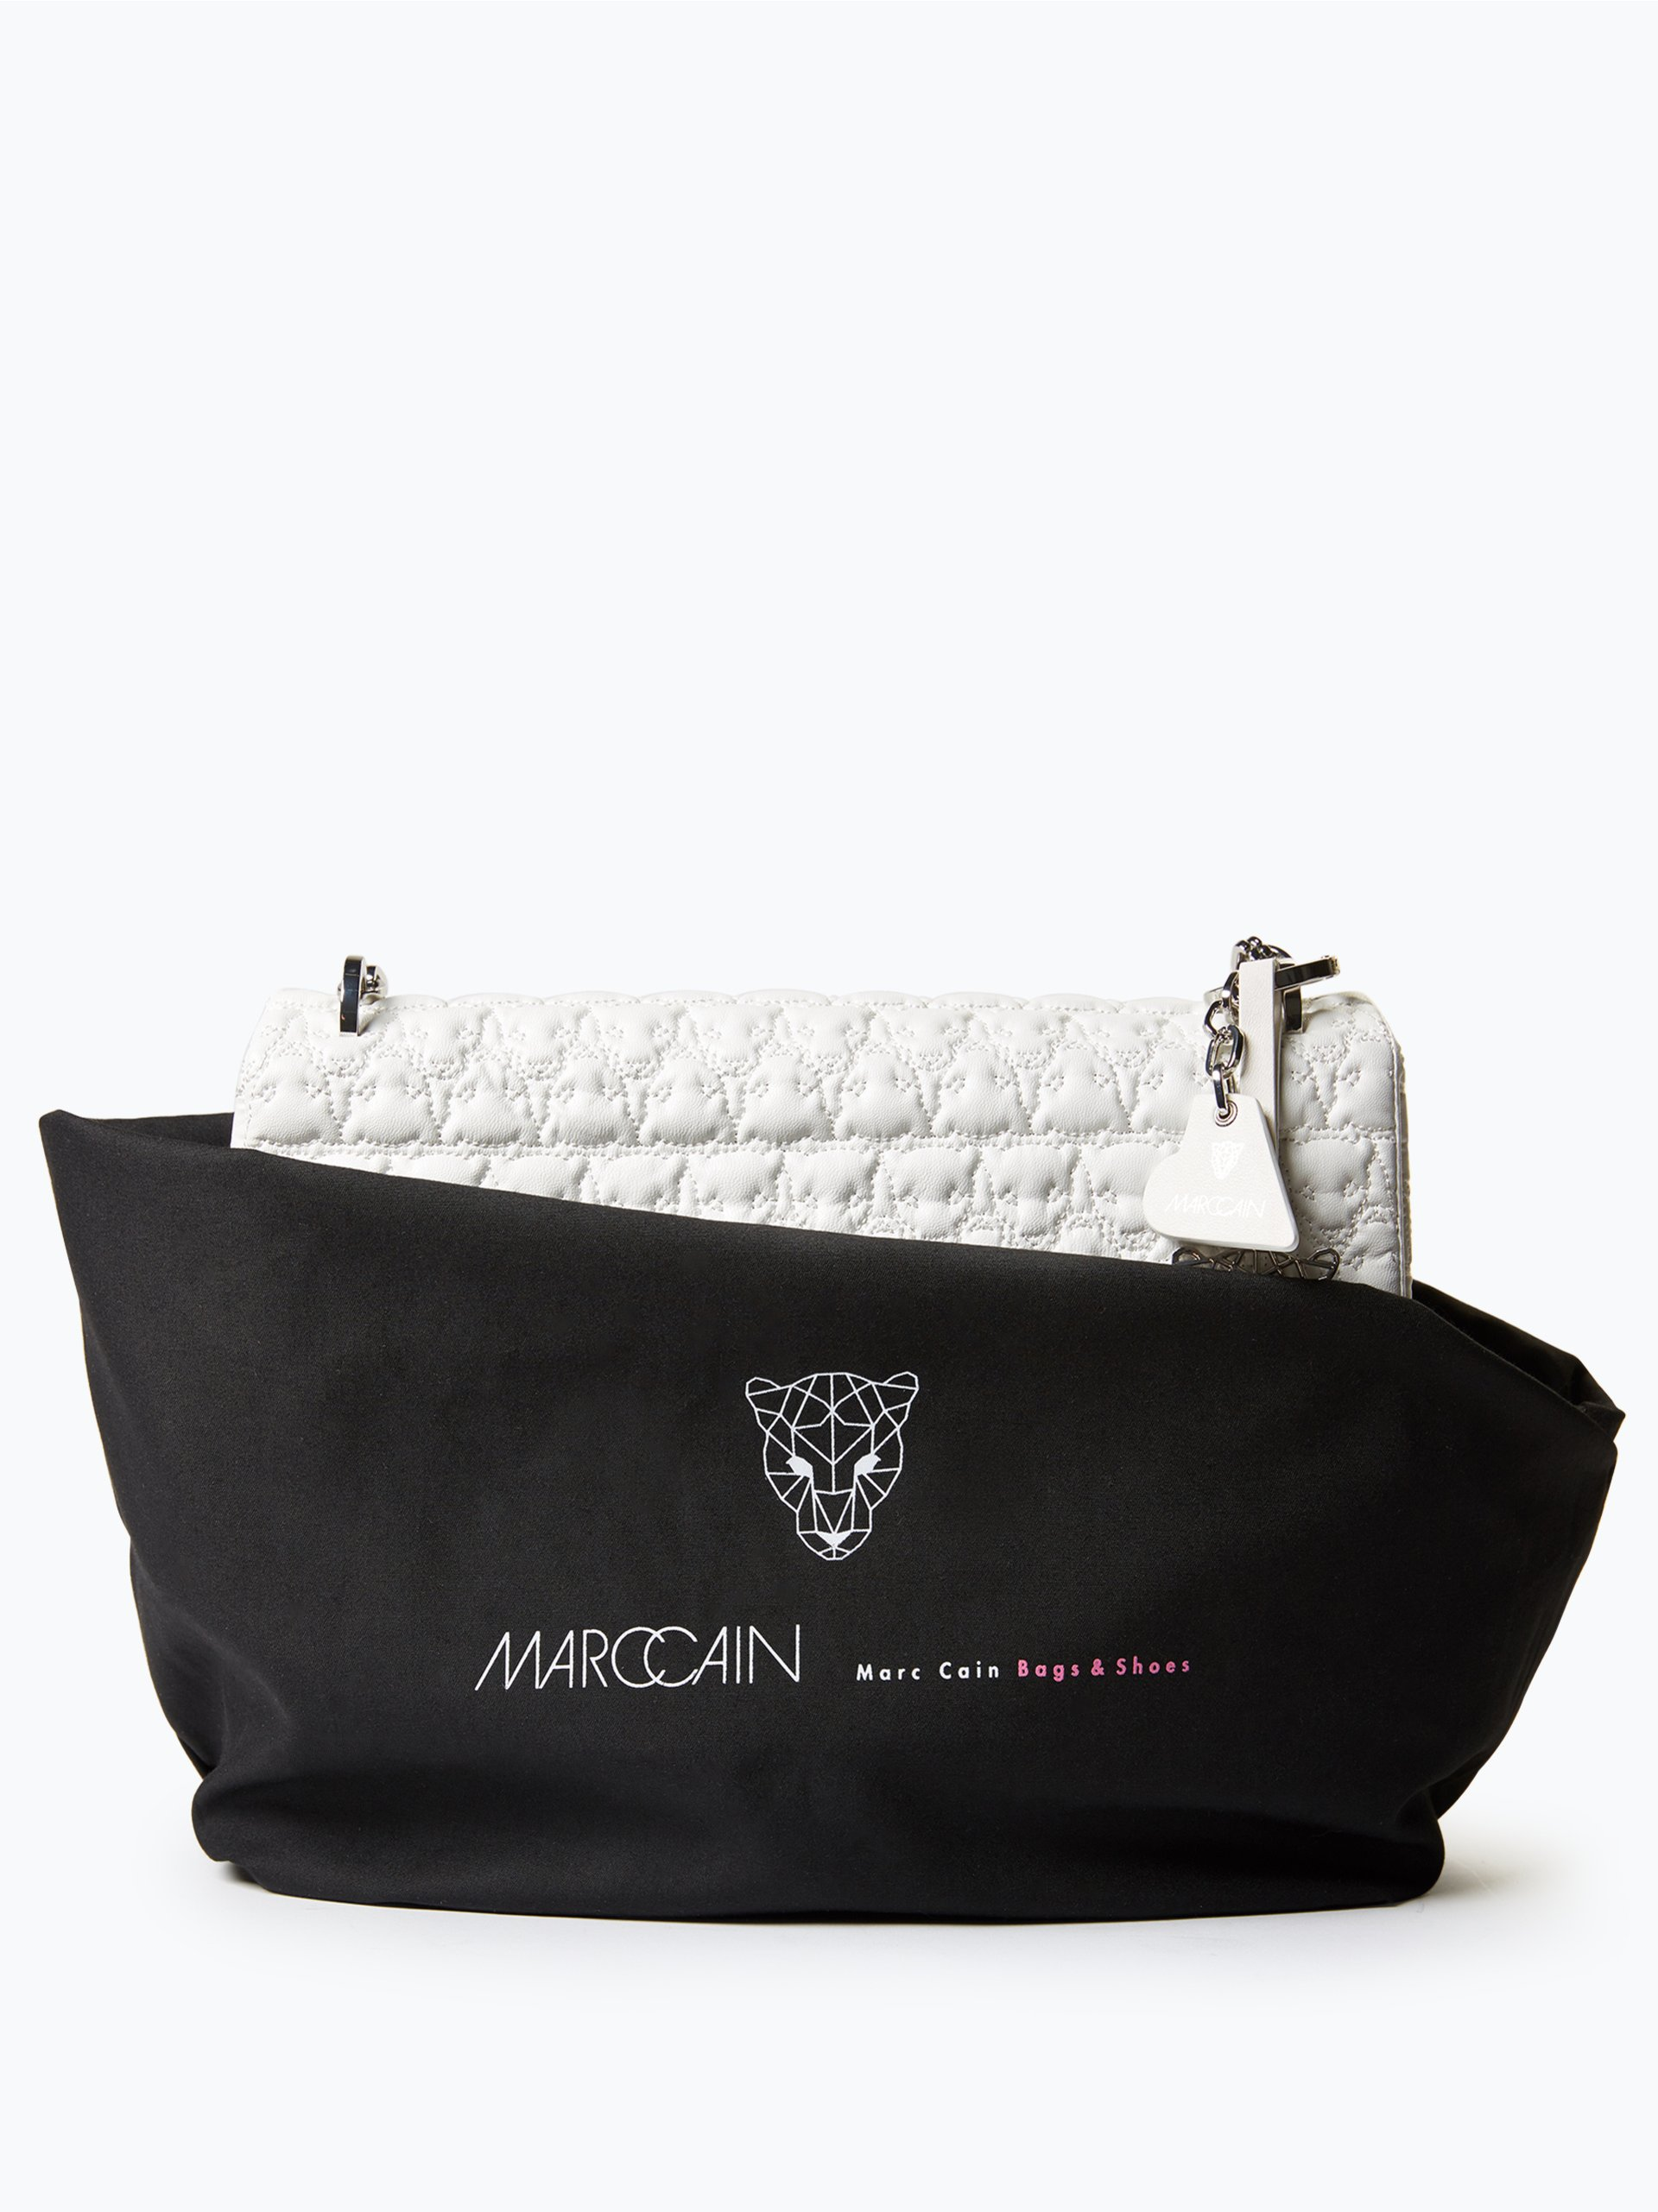 marc cain bags shoes damen handtasche mit leder anteil wei uni online kaufen peek und. Black Bedroom Furniture Sets. Home Design Ideas